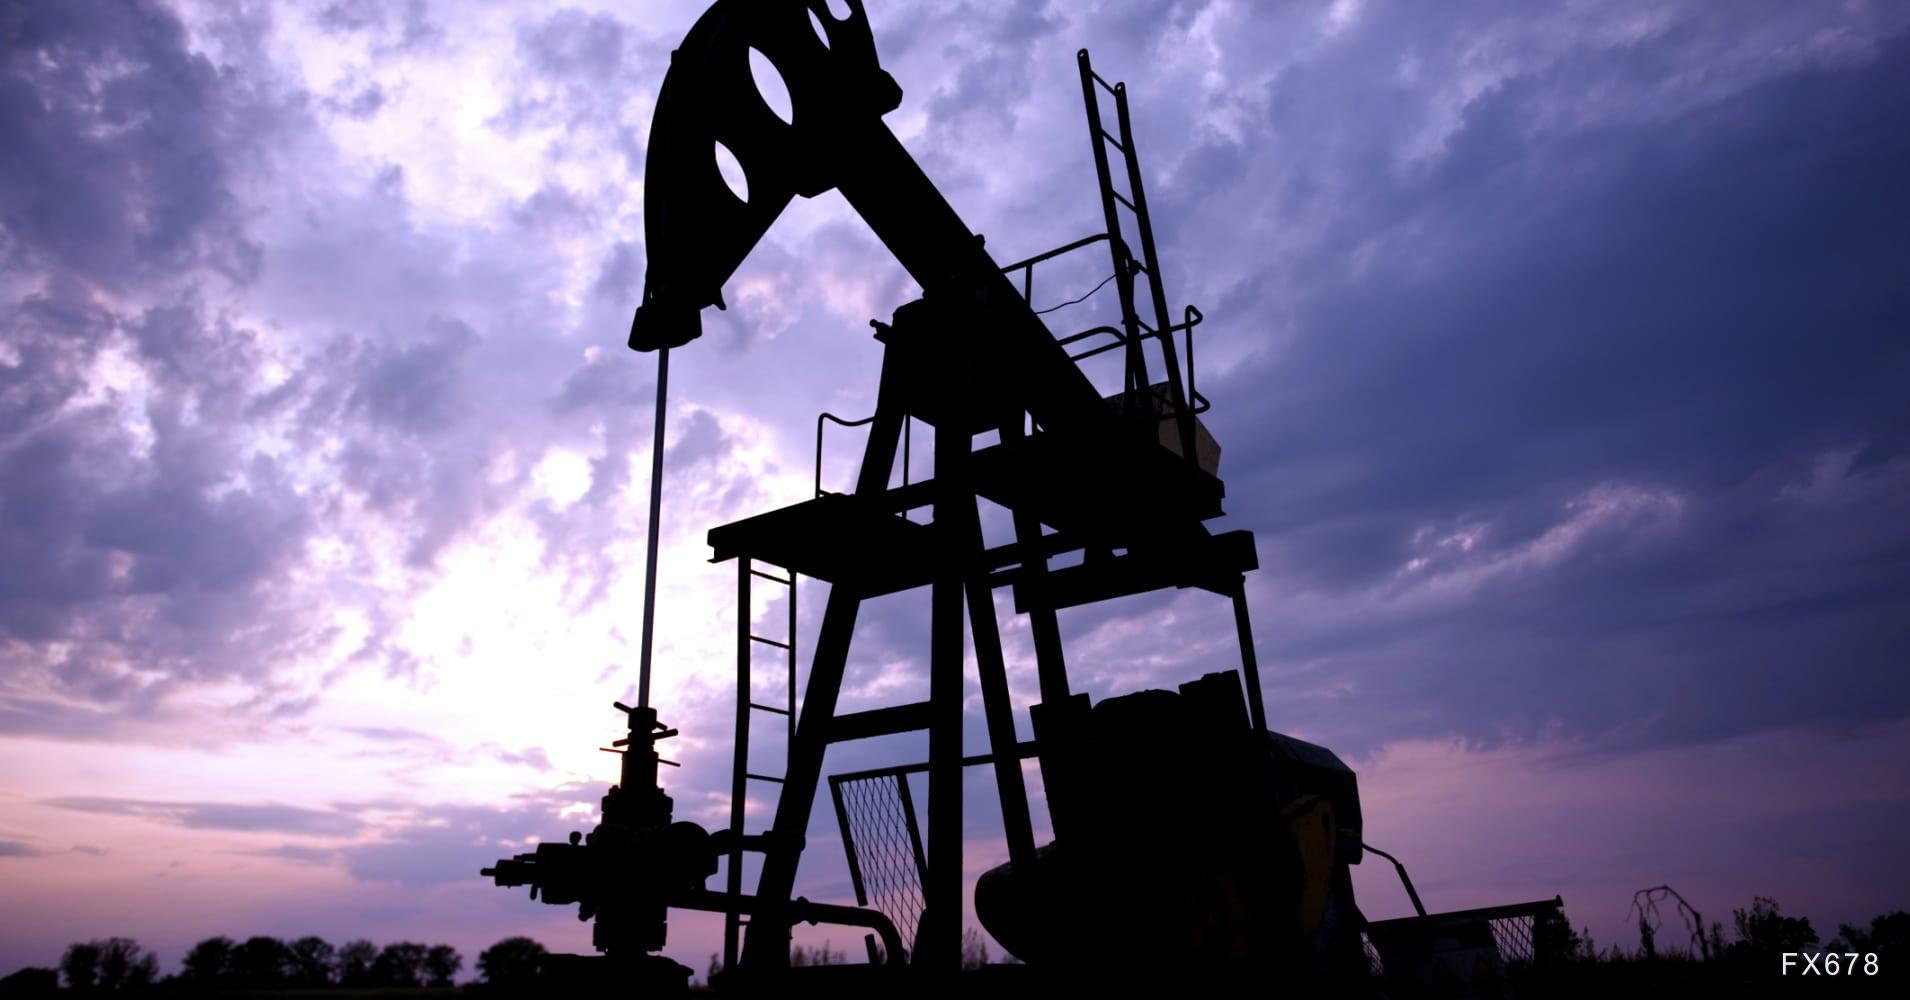 INE原油大涨逾3%,创去年3月以来新高;沙特重申信守诺言,OPEC+会议应关注两大国博弈